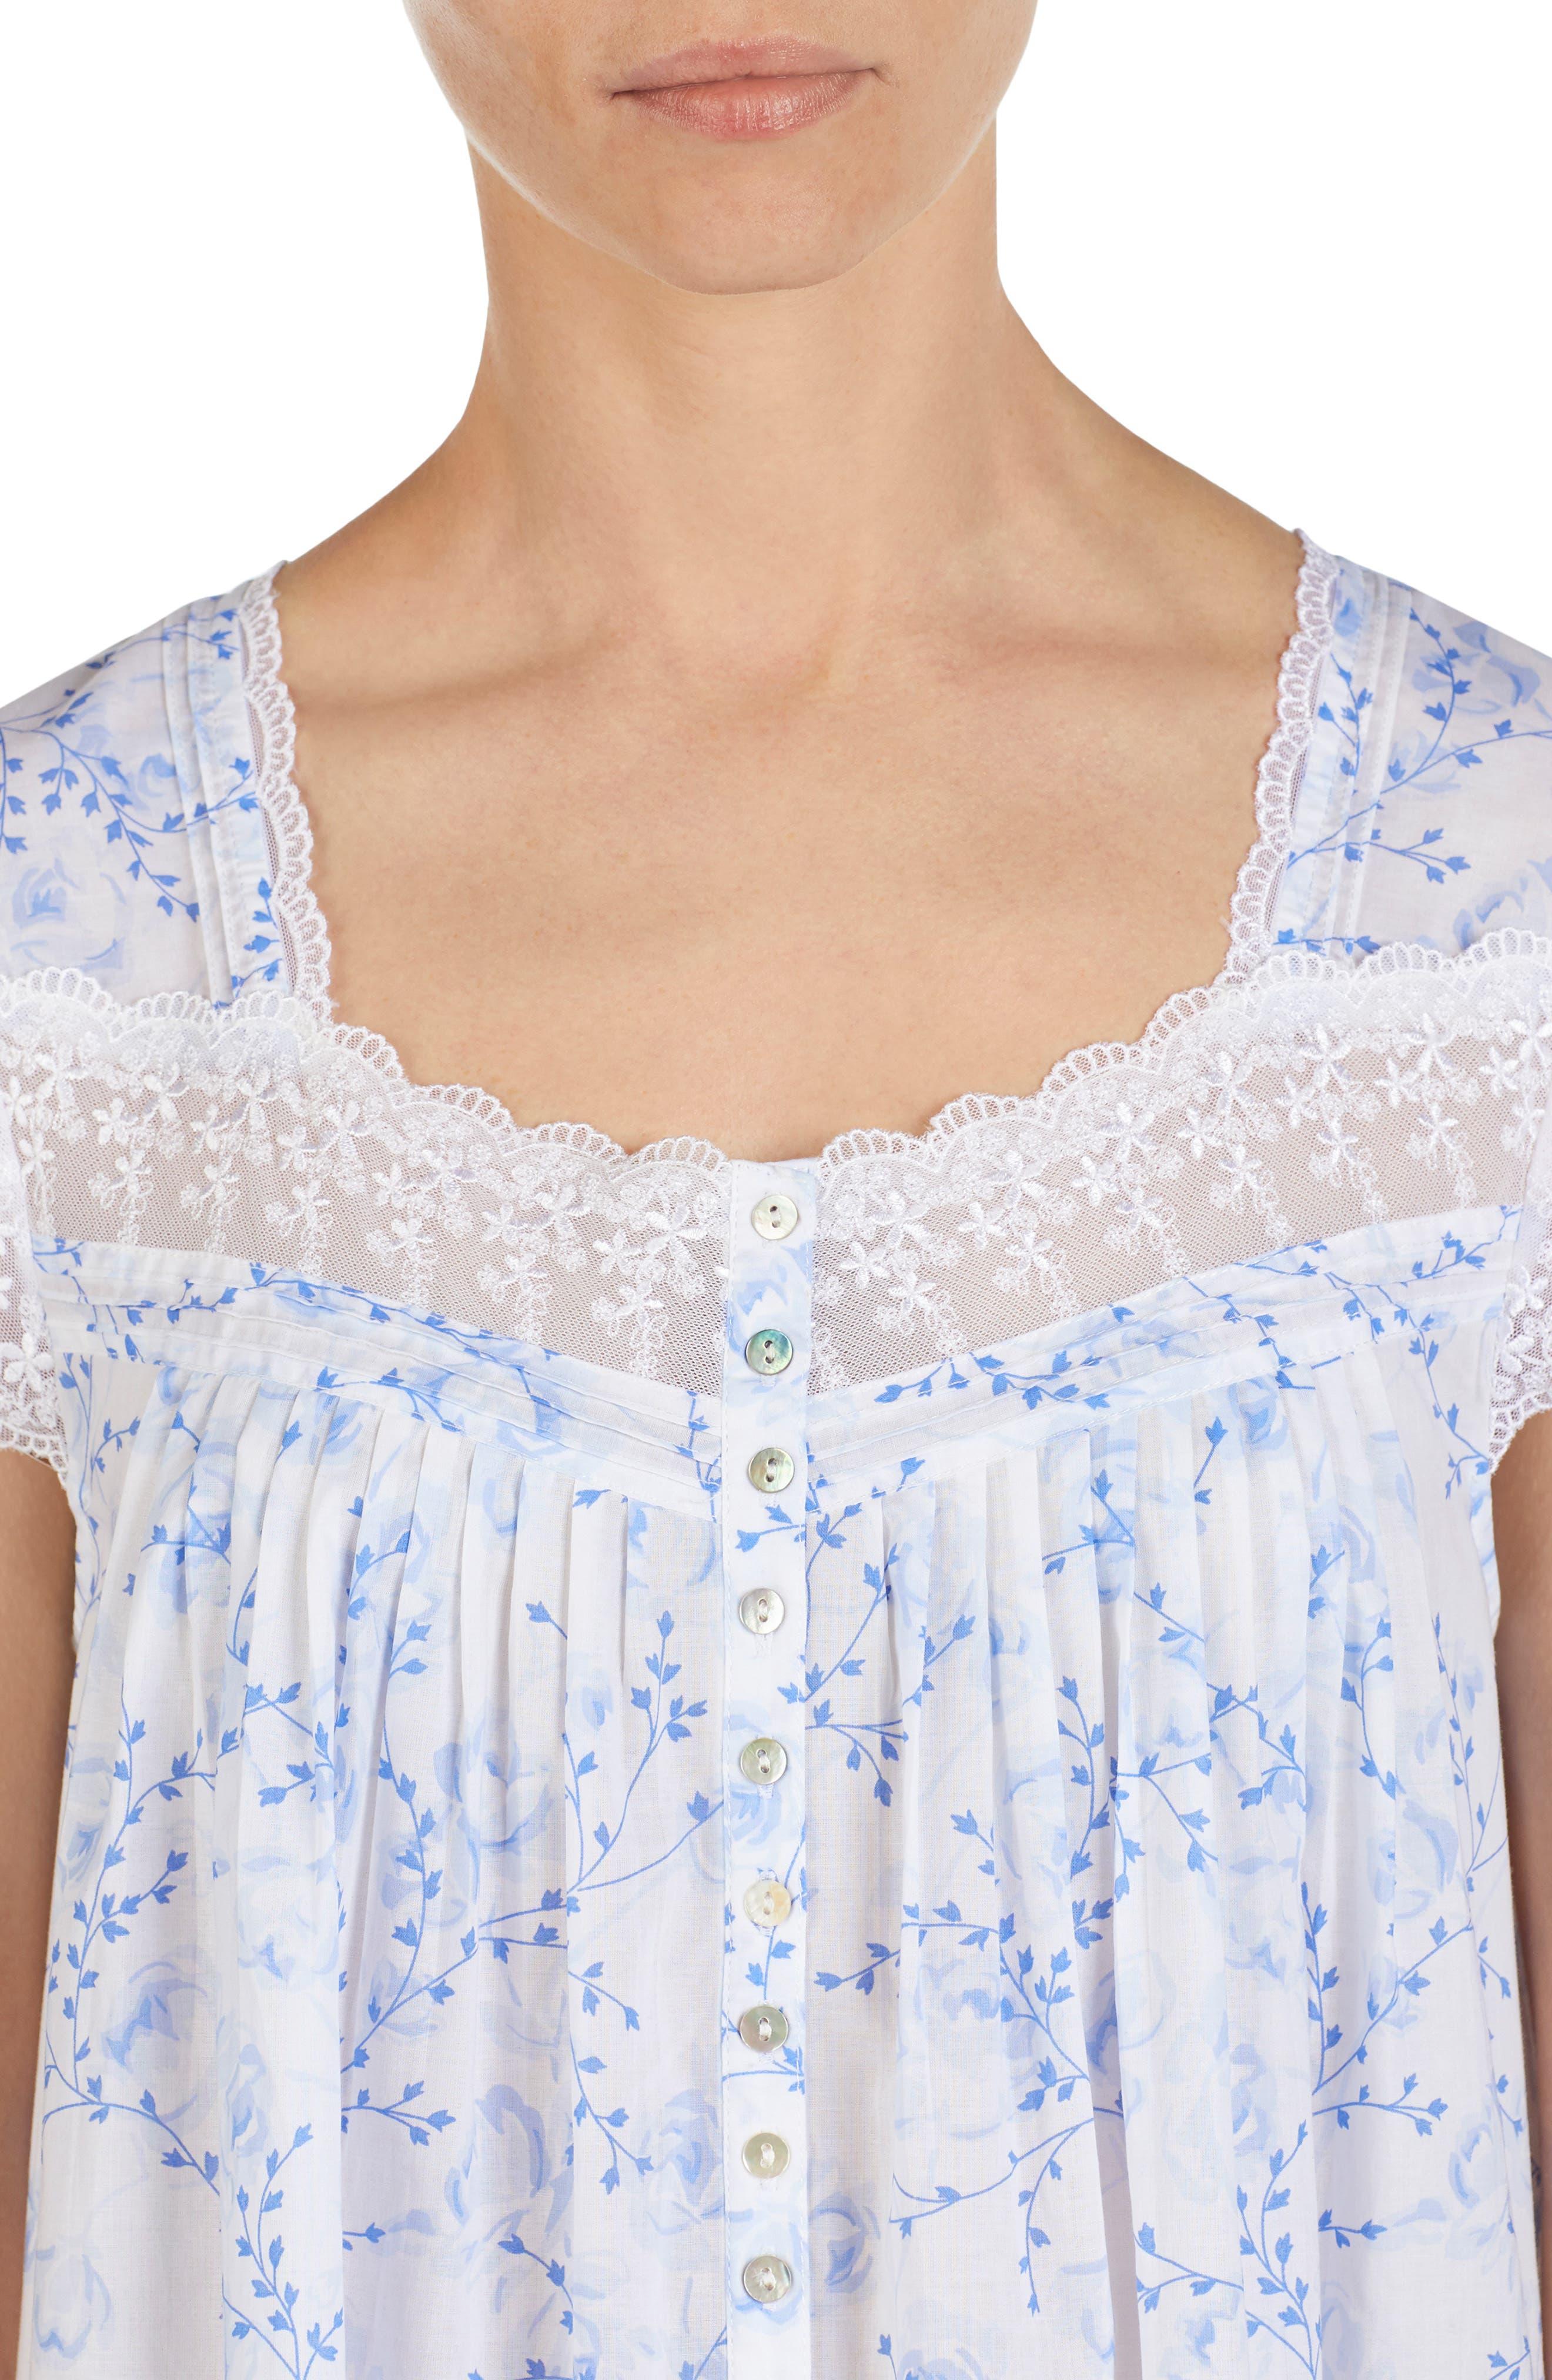 EILEEN WEST, Cotton Lawn Nightgown, Alternate thumbnail 3, color, BLUE FLORAL